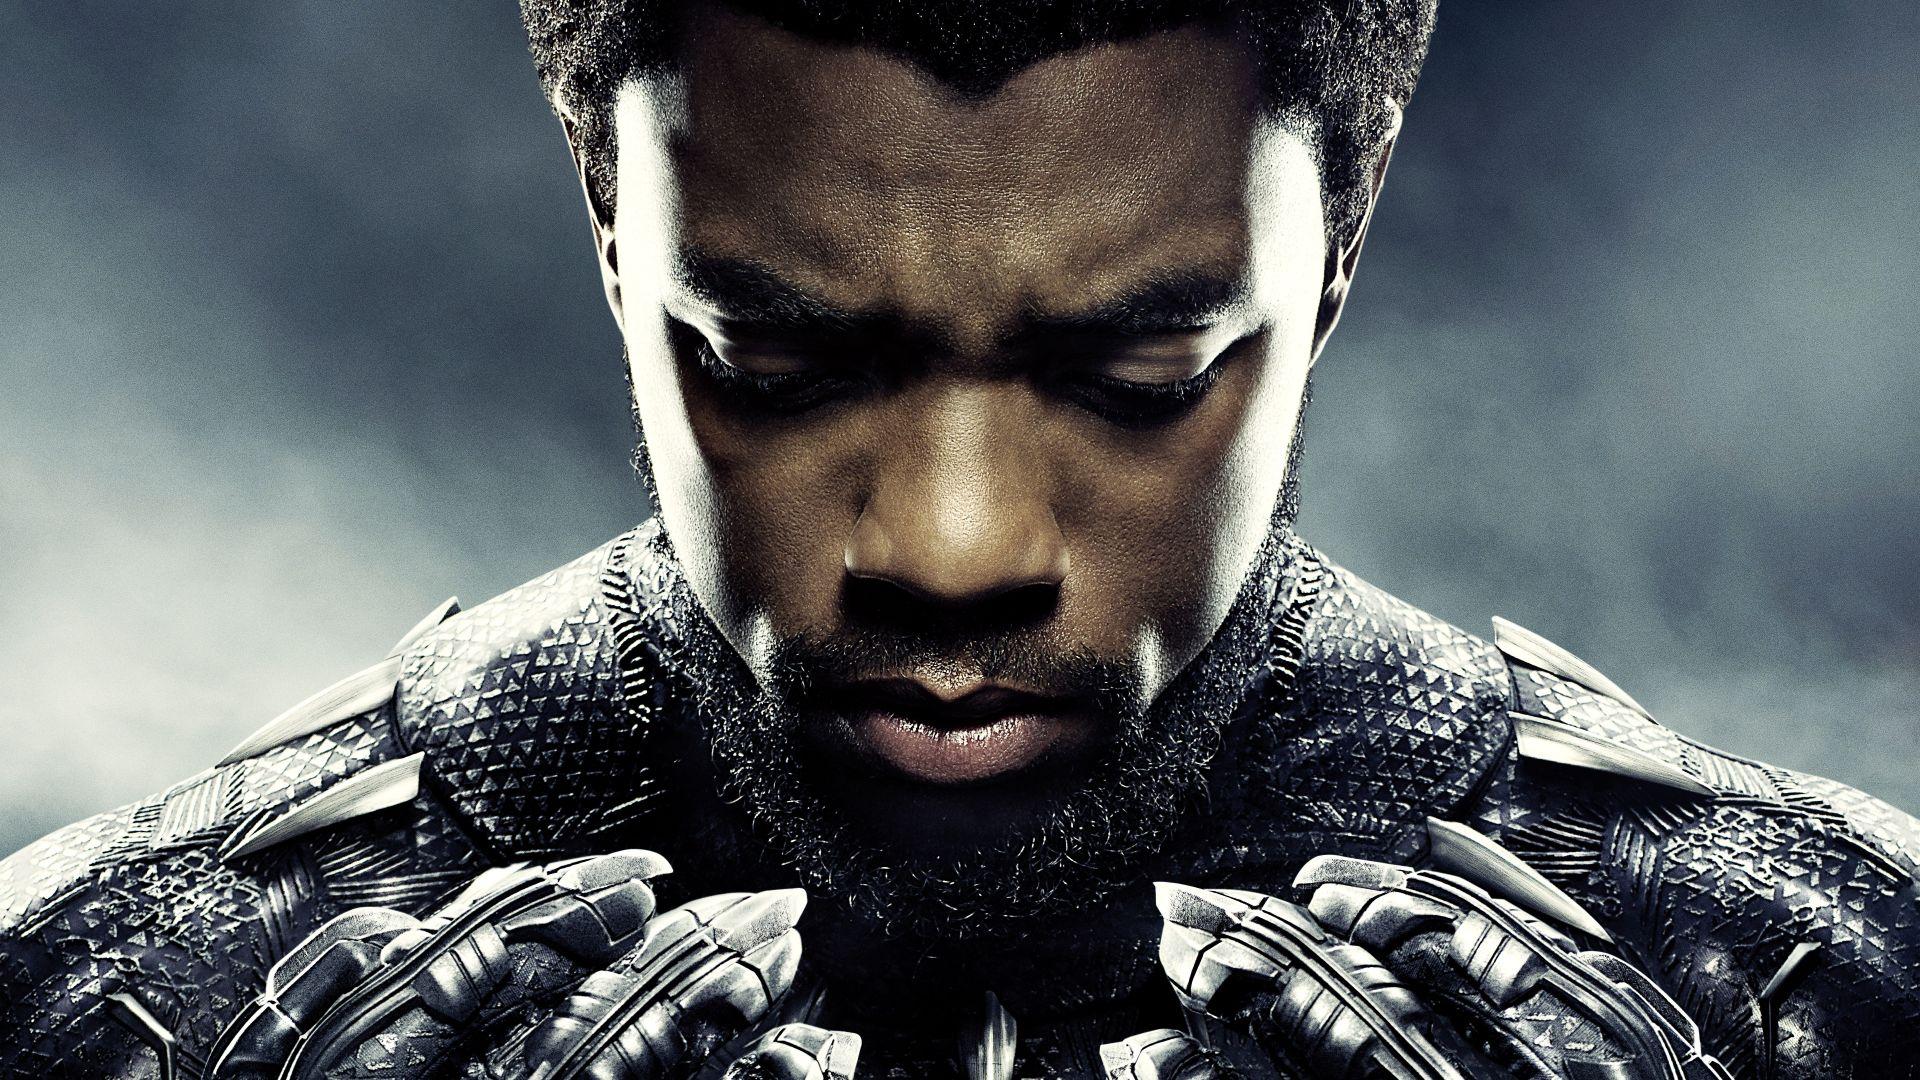 2932x2932 Pubg Android Game 4k Ipad Pro Retina Display Hd: Wallpaper Black Panther, Chadwick Boseman, 8k, Movies #16998